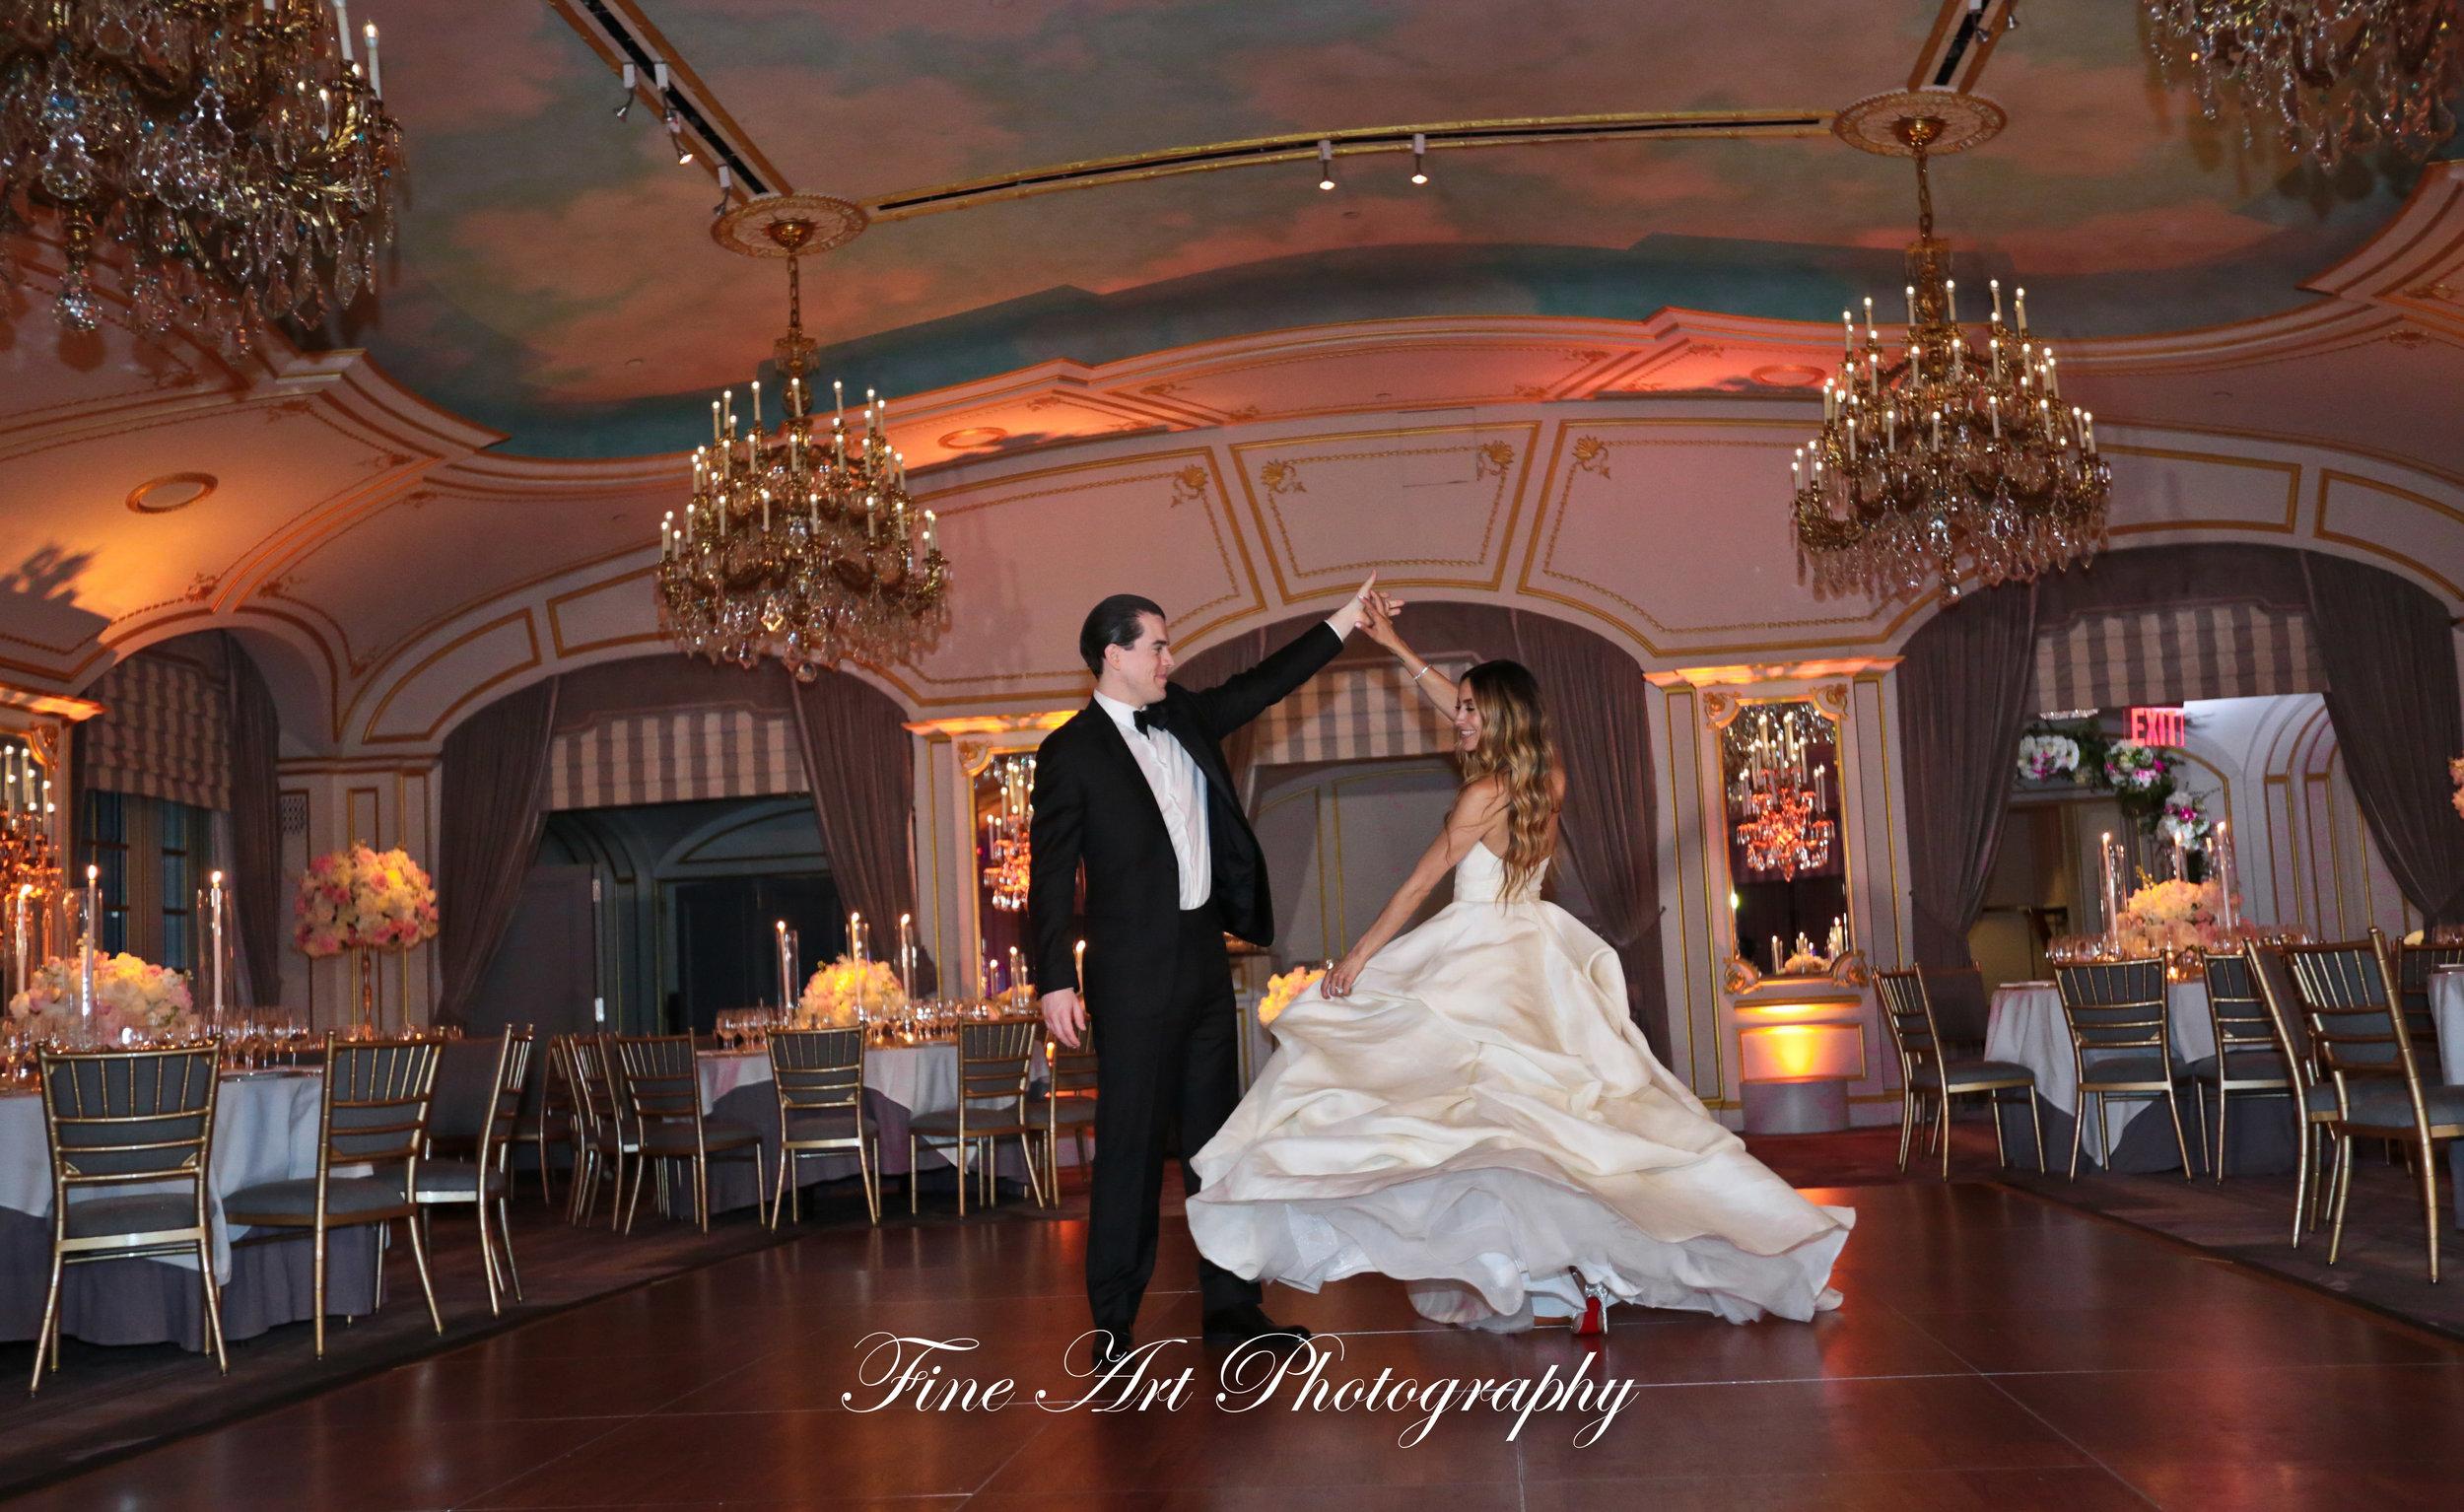 Photography - Fine Art Photography